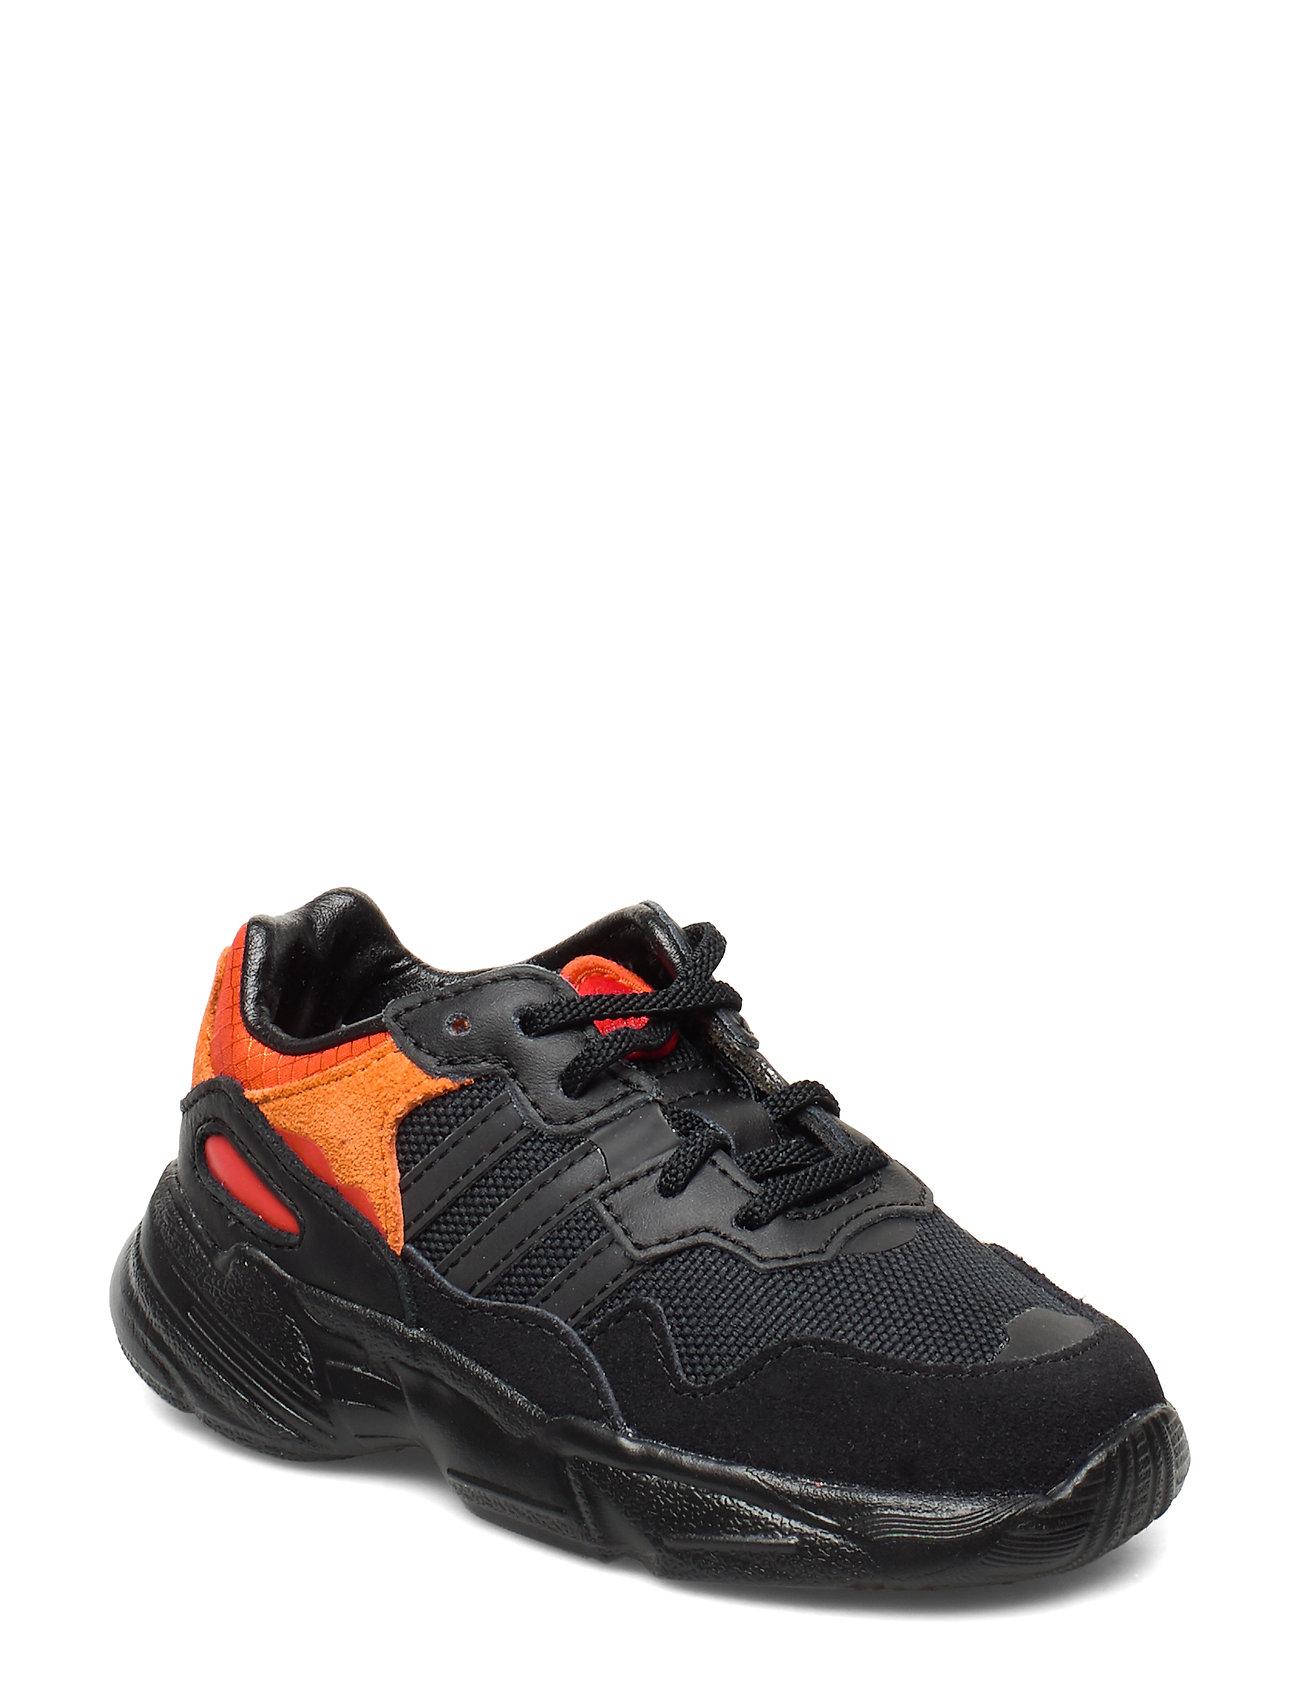 adidas Originals YUNG-96 EL I - CBLACK/CBLACK/CWHITE